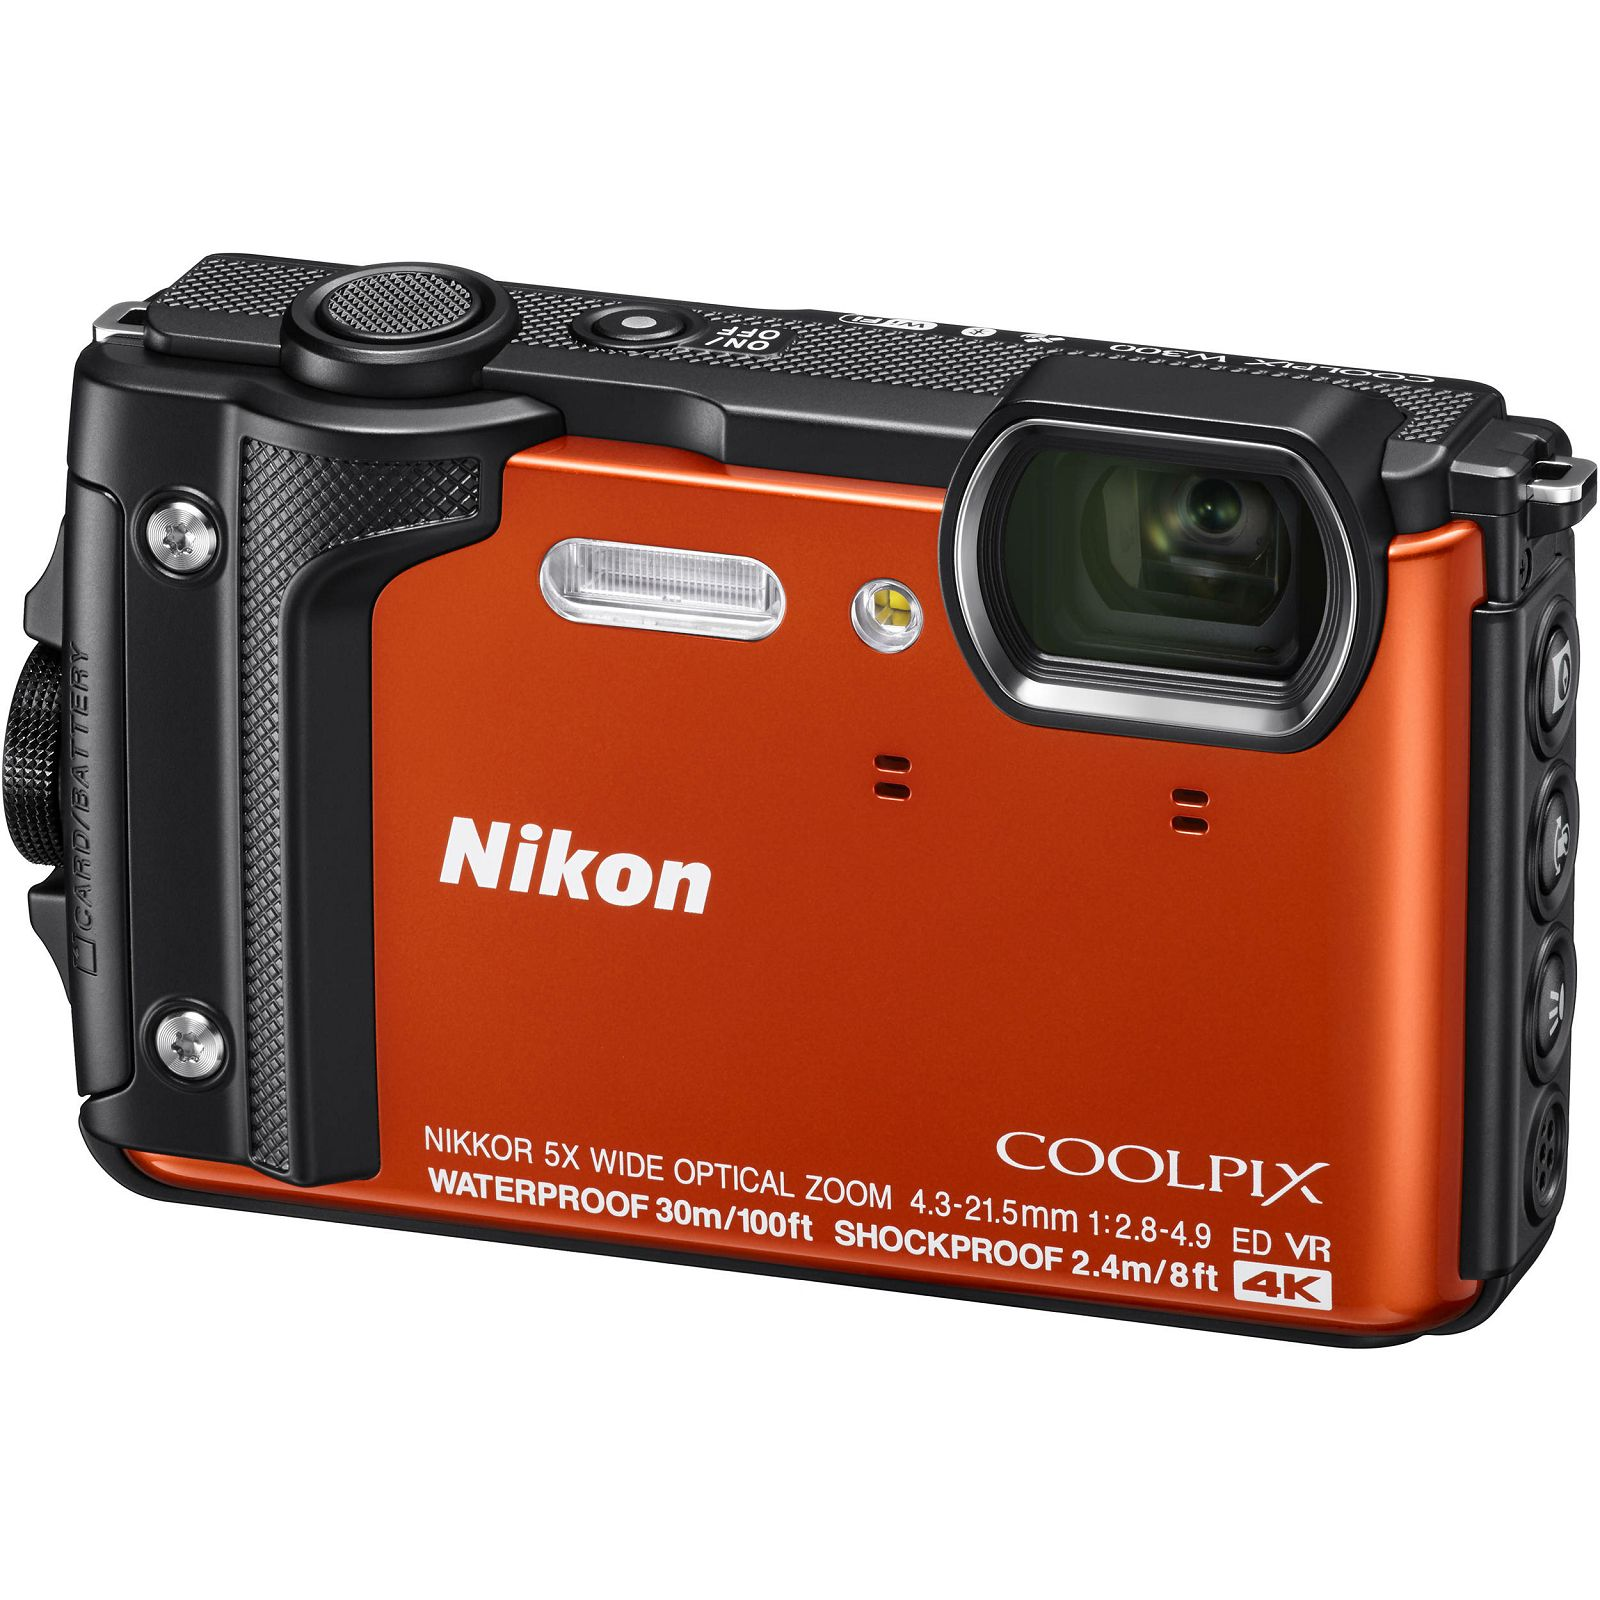 Nikon Coolpix W300 Orange narančasti digitalni kompaktni vodootporni fotoaparat 16MPx 4K UHD 5x zoom (VQA071E1) - TRENUTNA UŠTEDA